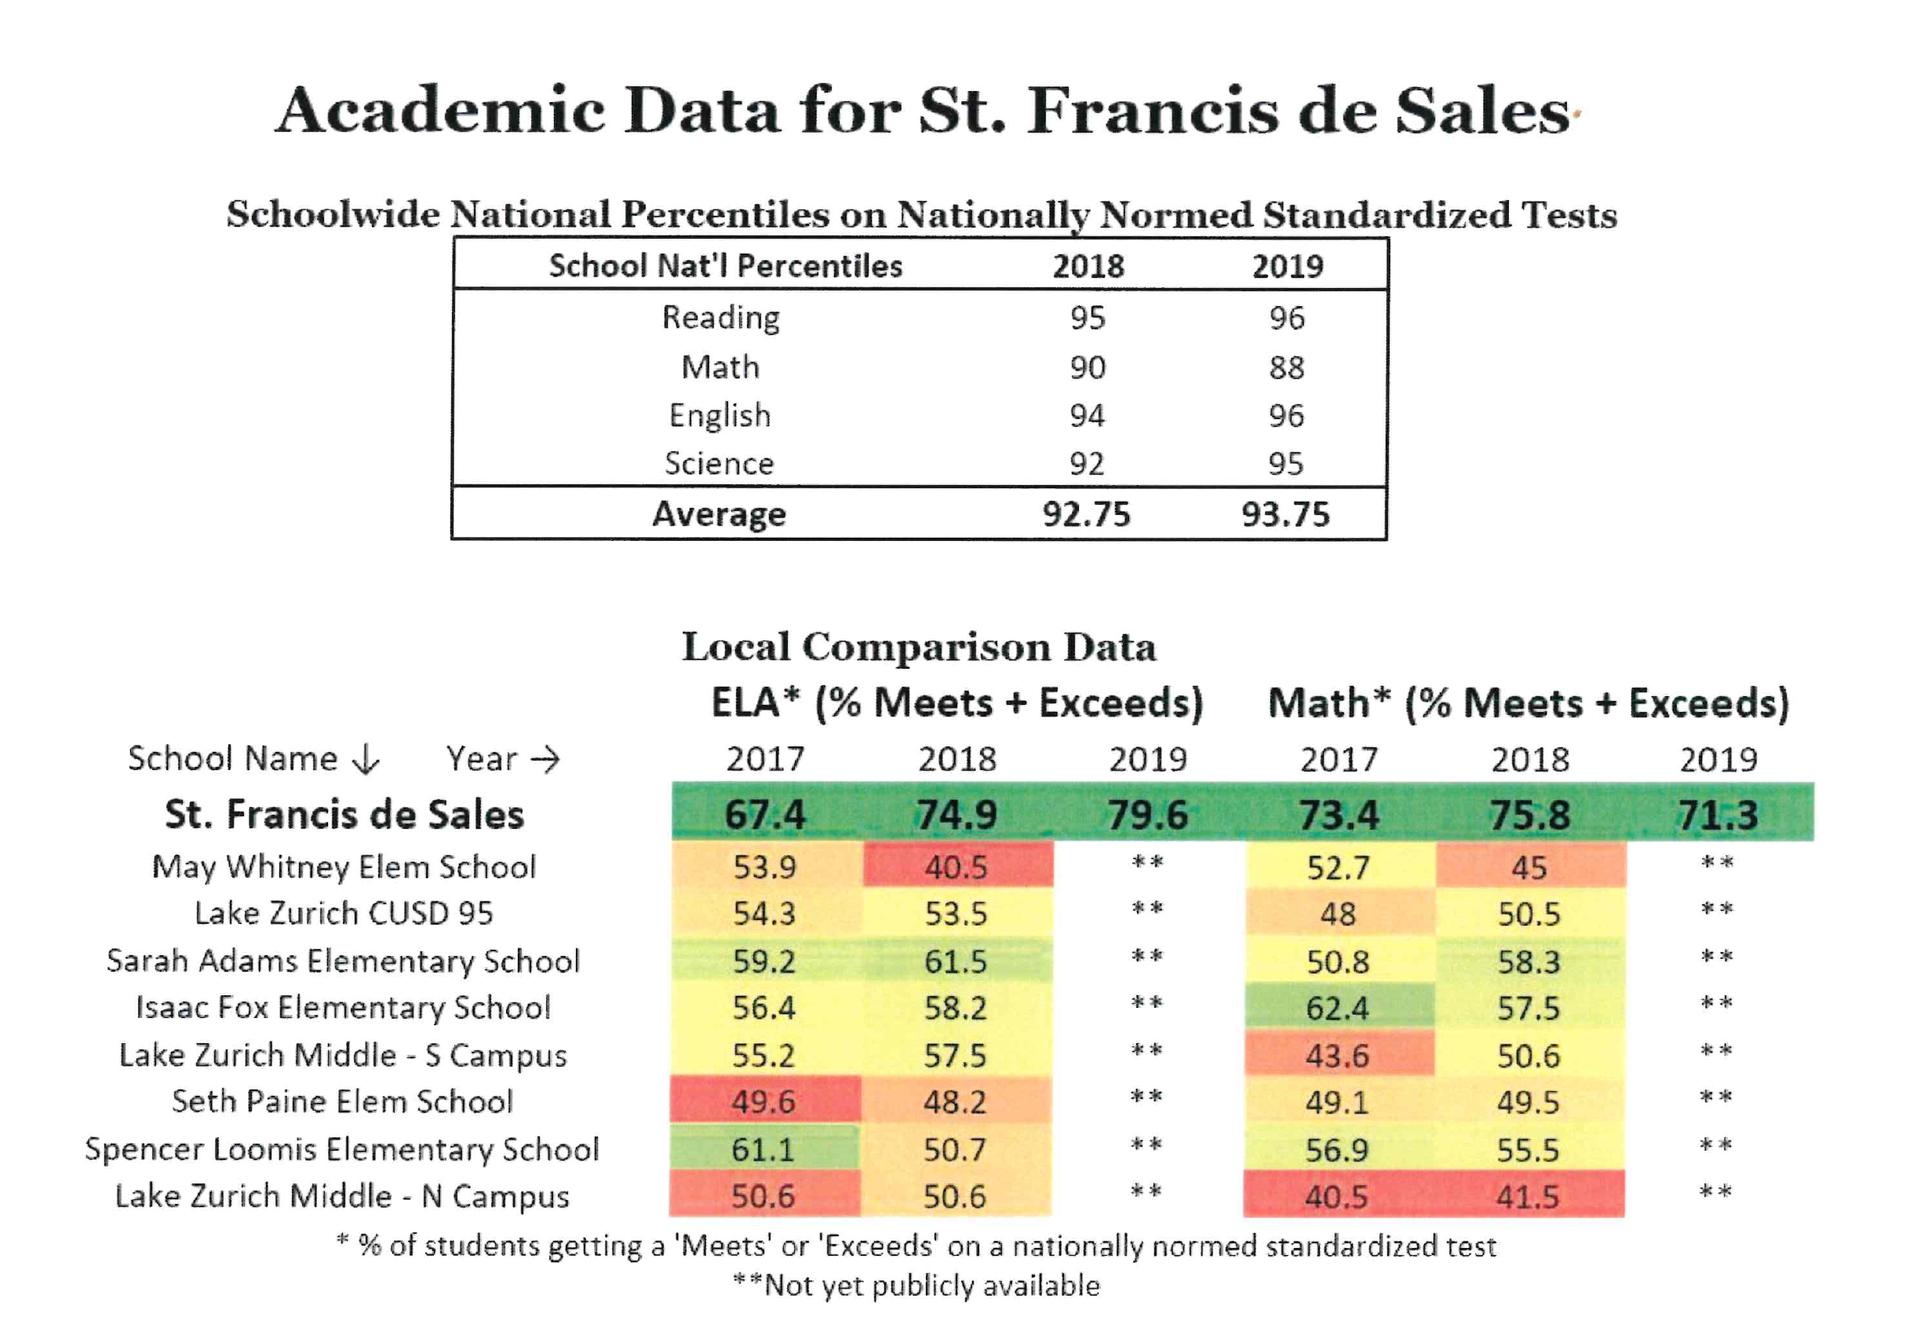 Academic Data for SFS